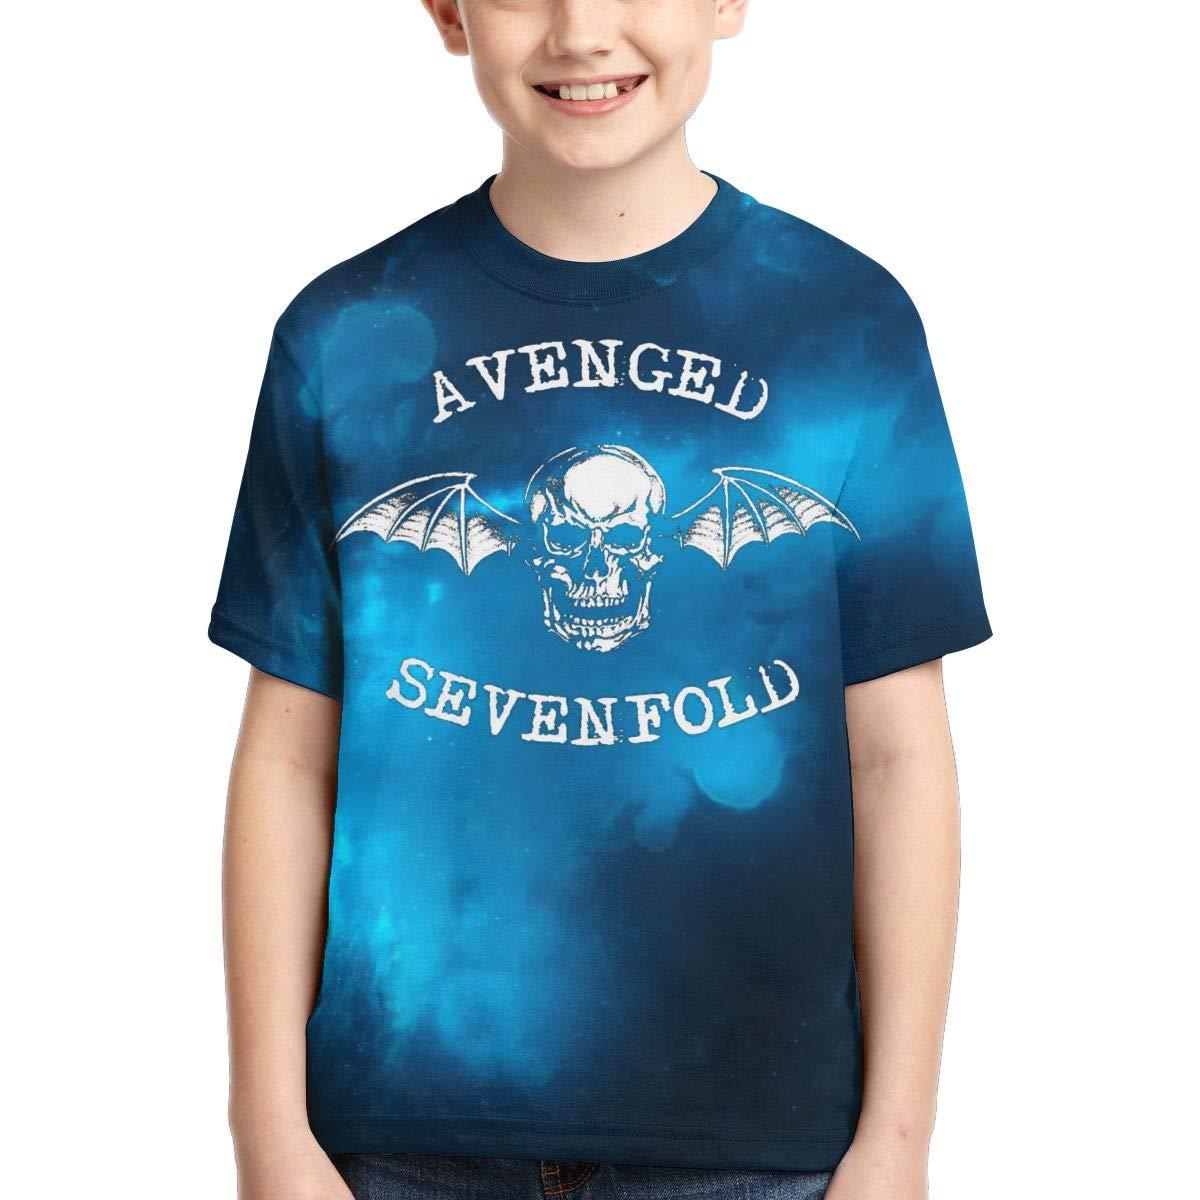 Zengqinglove Boys,Girls,Youth Avenged Sevenfold Tshirts